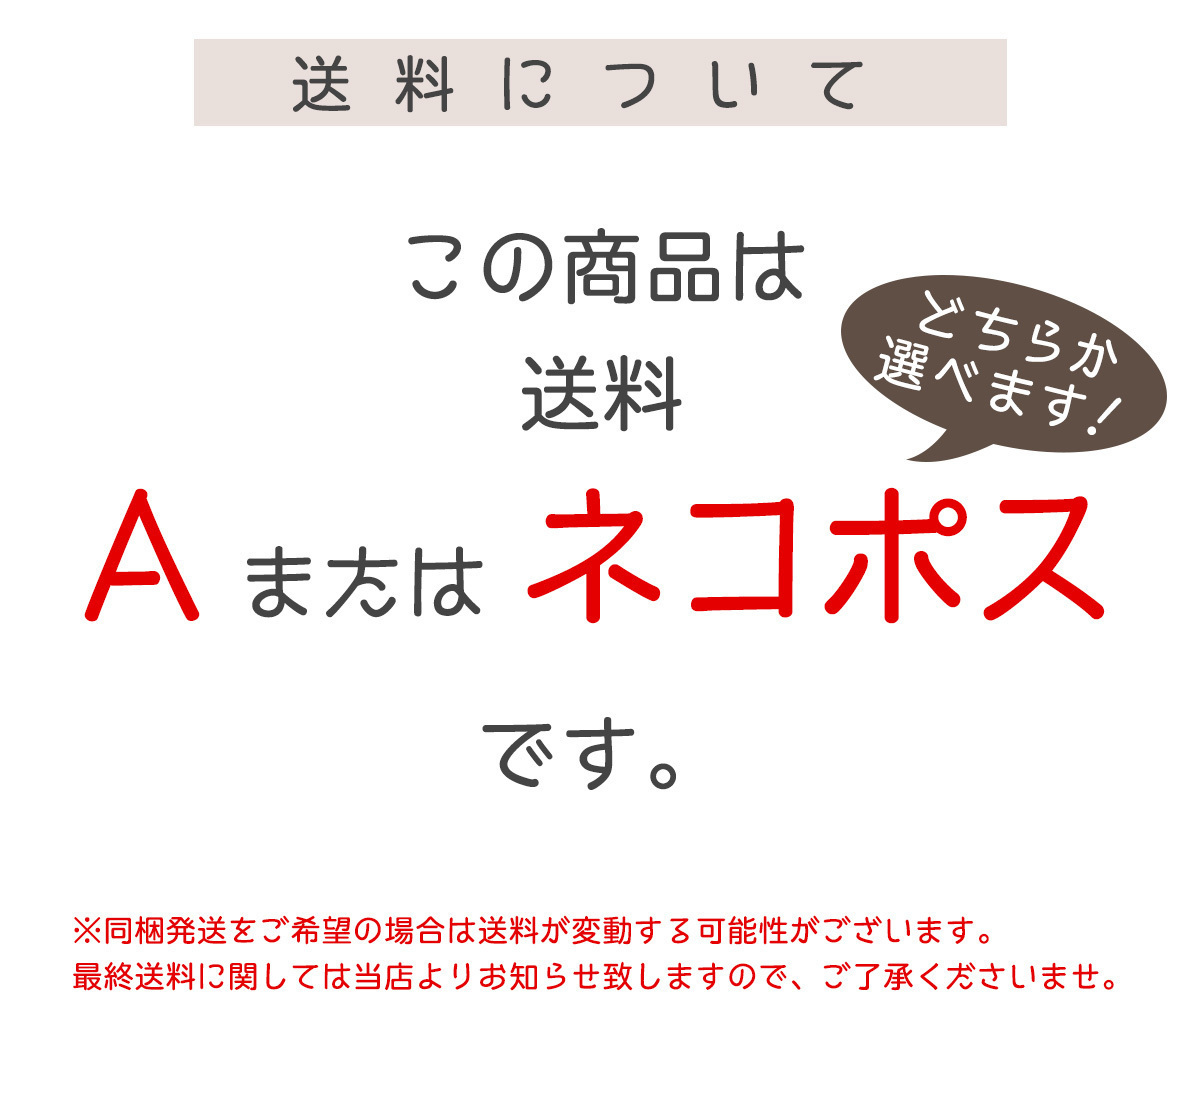 ▼ wonder 麹まるごと贅沢青汁 30袋入 賞味期限2022年4月9日迄 未開封品 ネコポス可_画像3